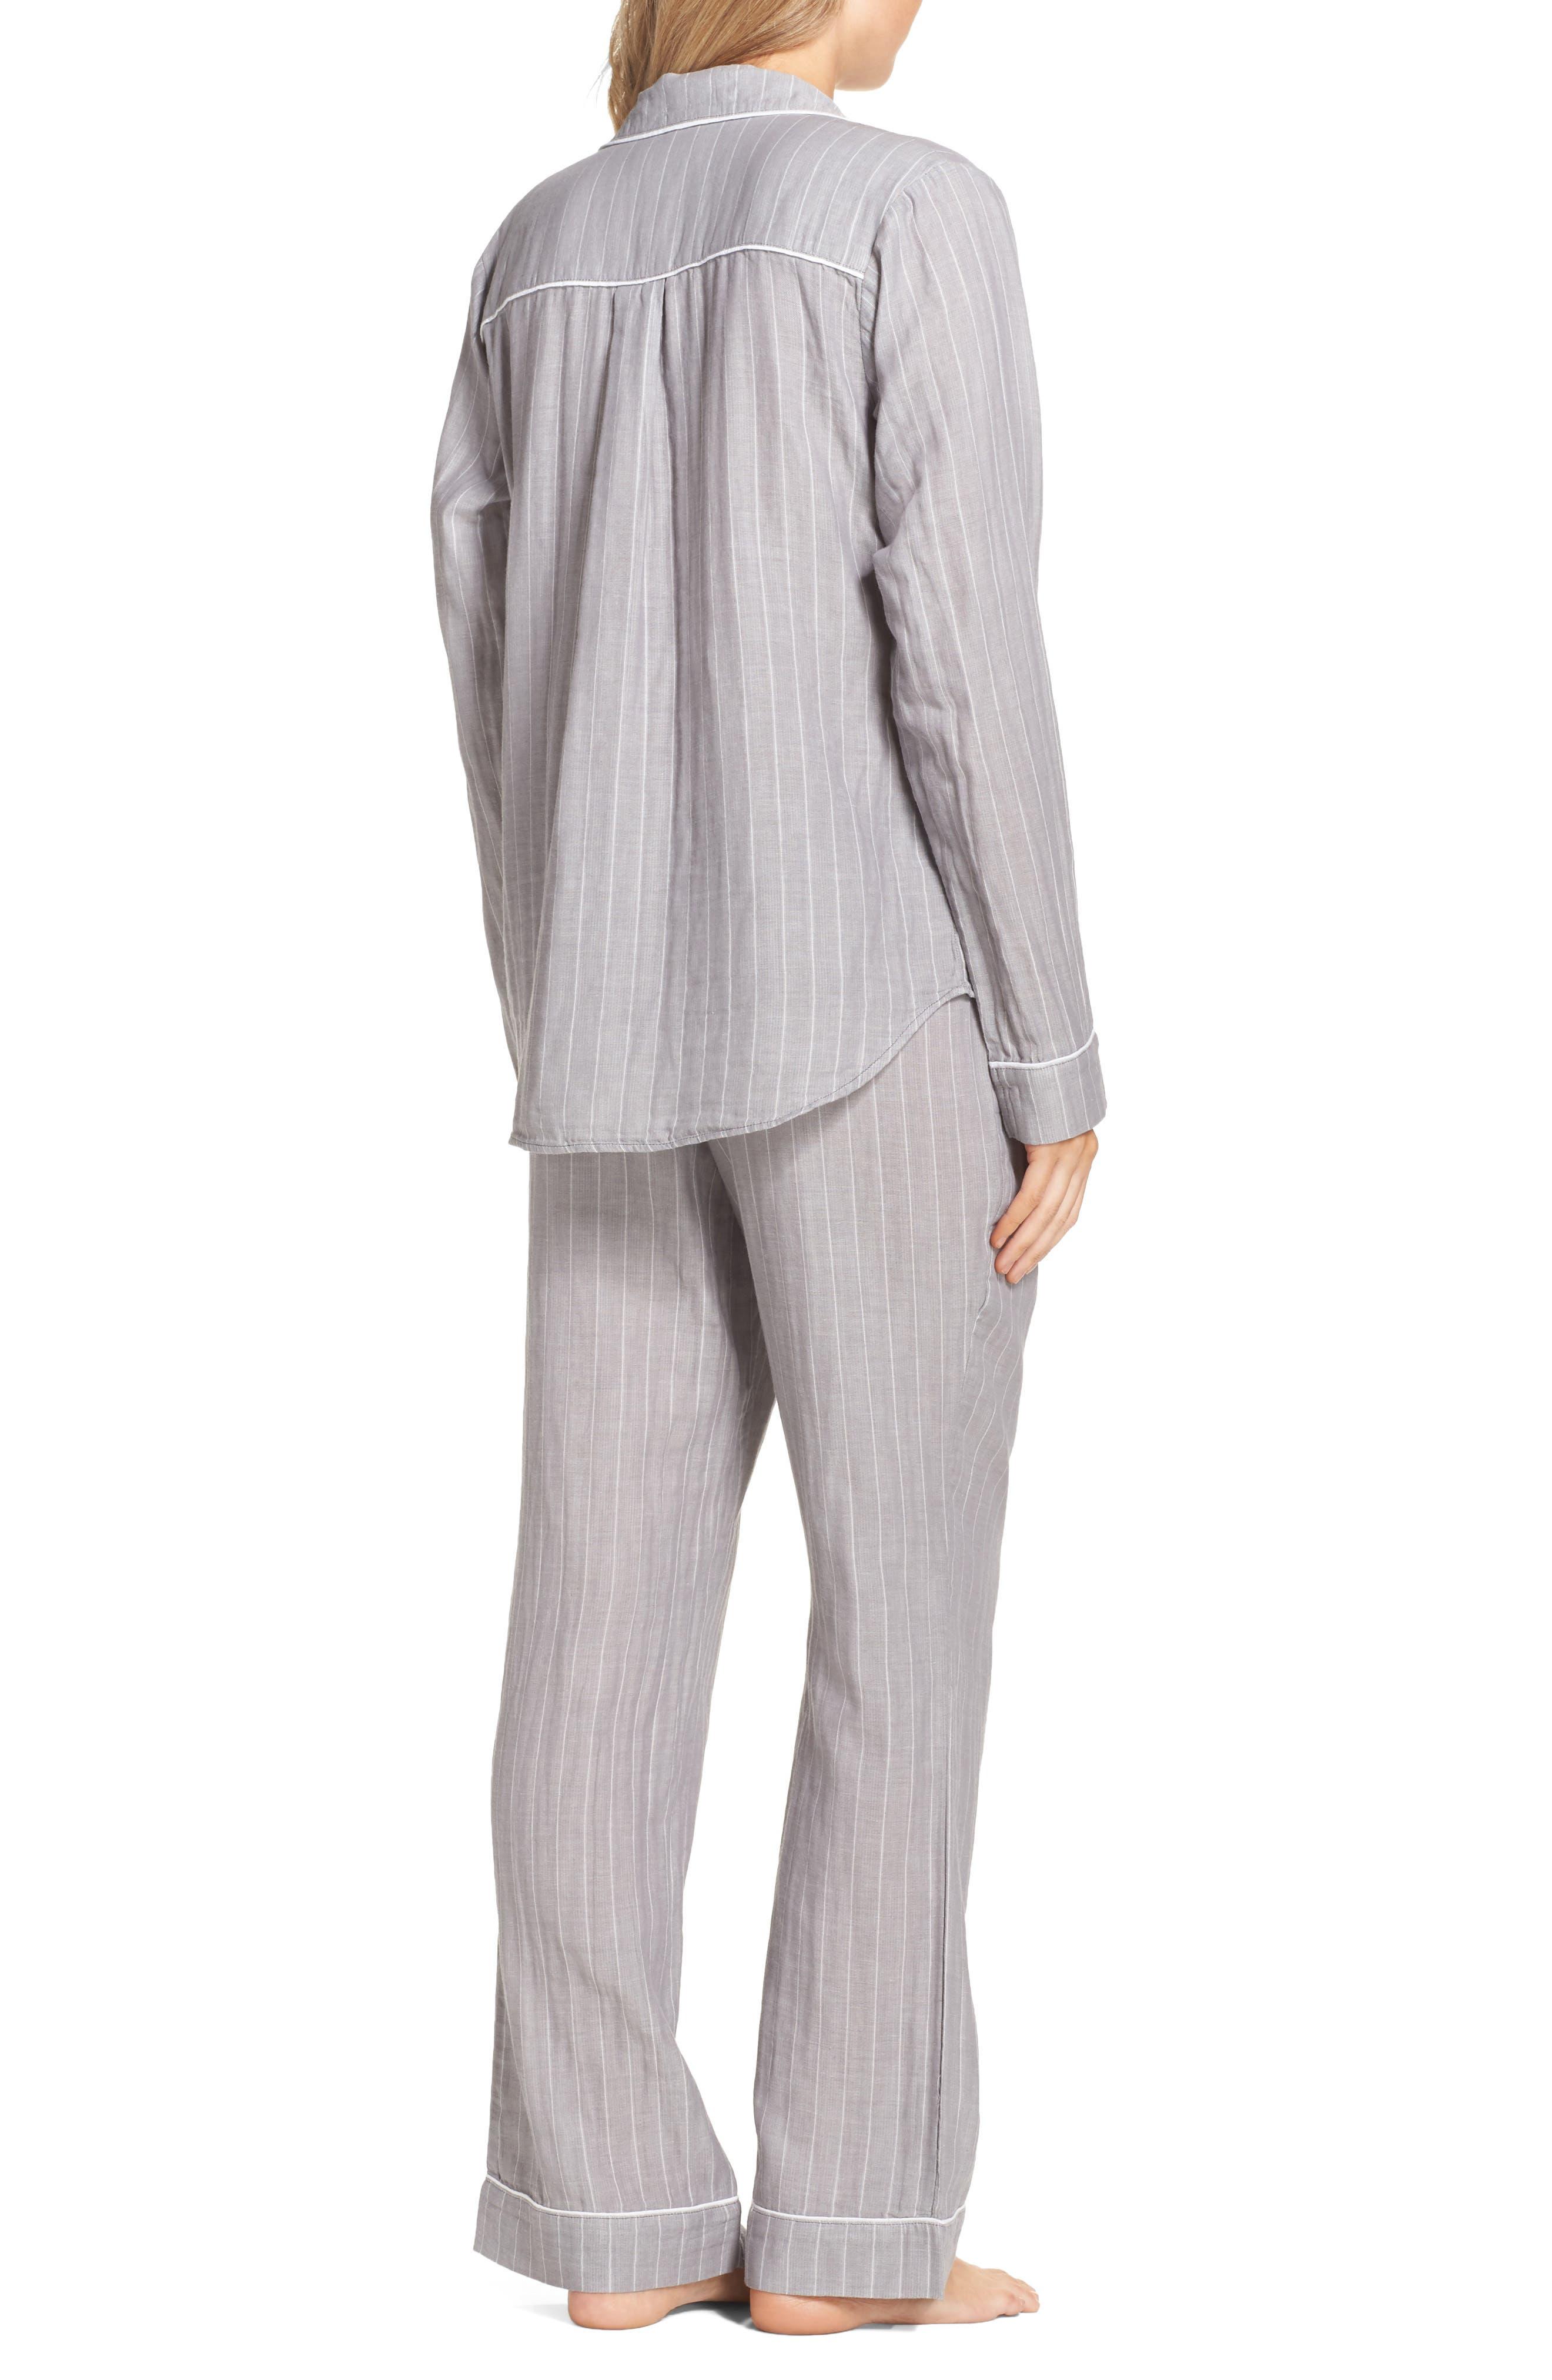 Raven Stripe Pajamas,                             Alternate thumbnail 2, color,                             Seal